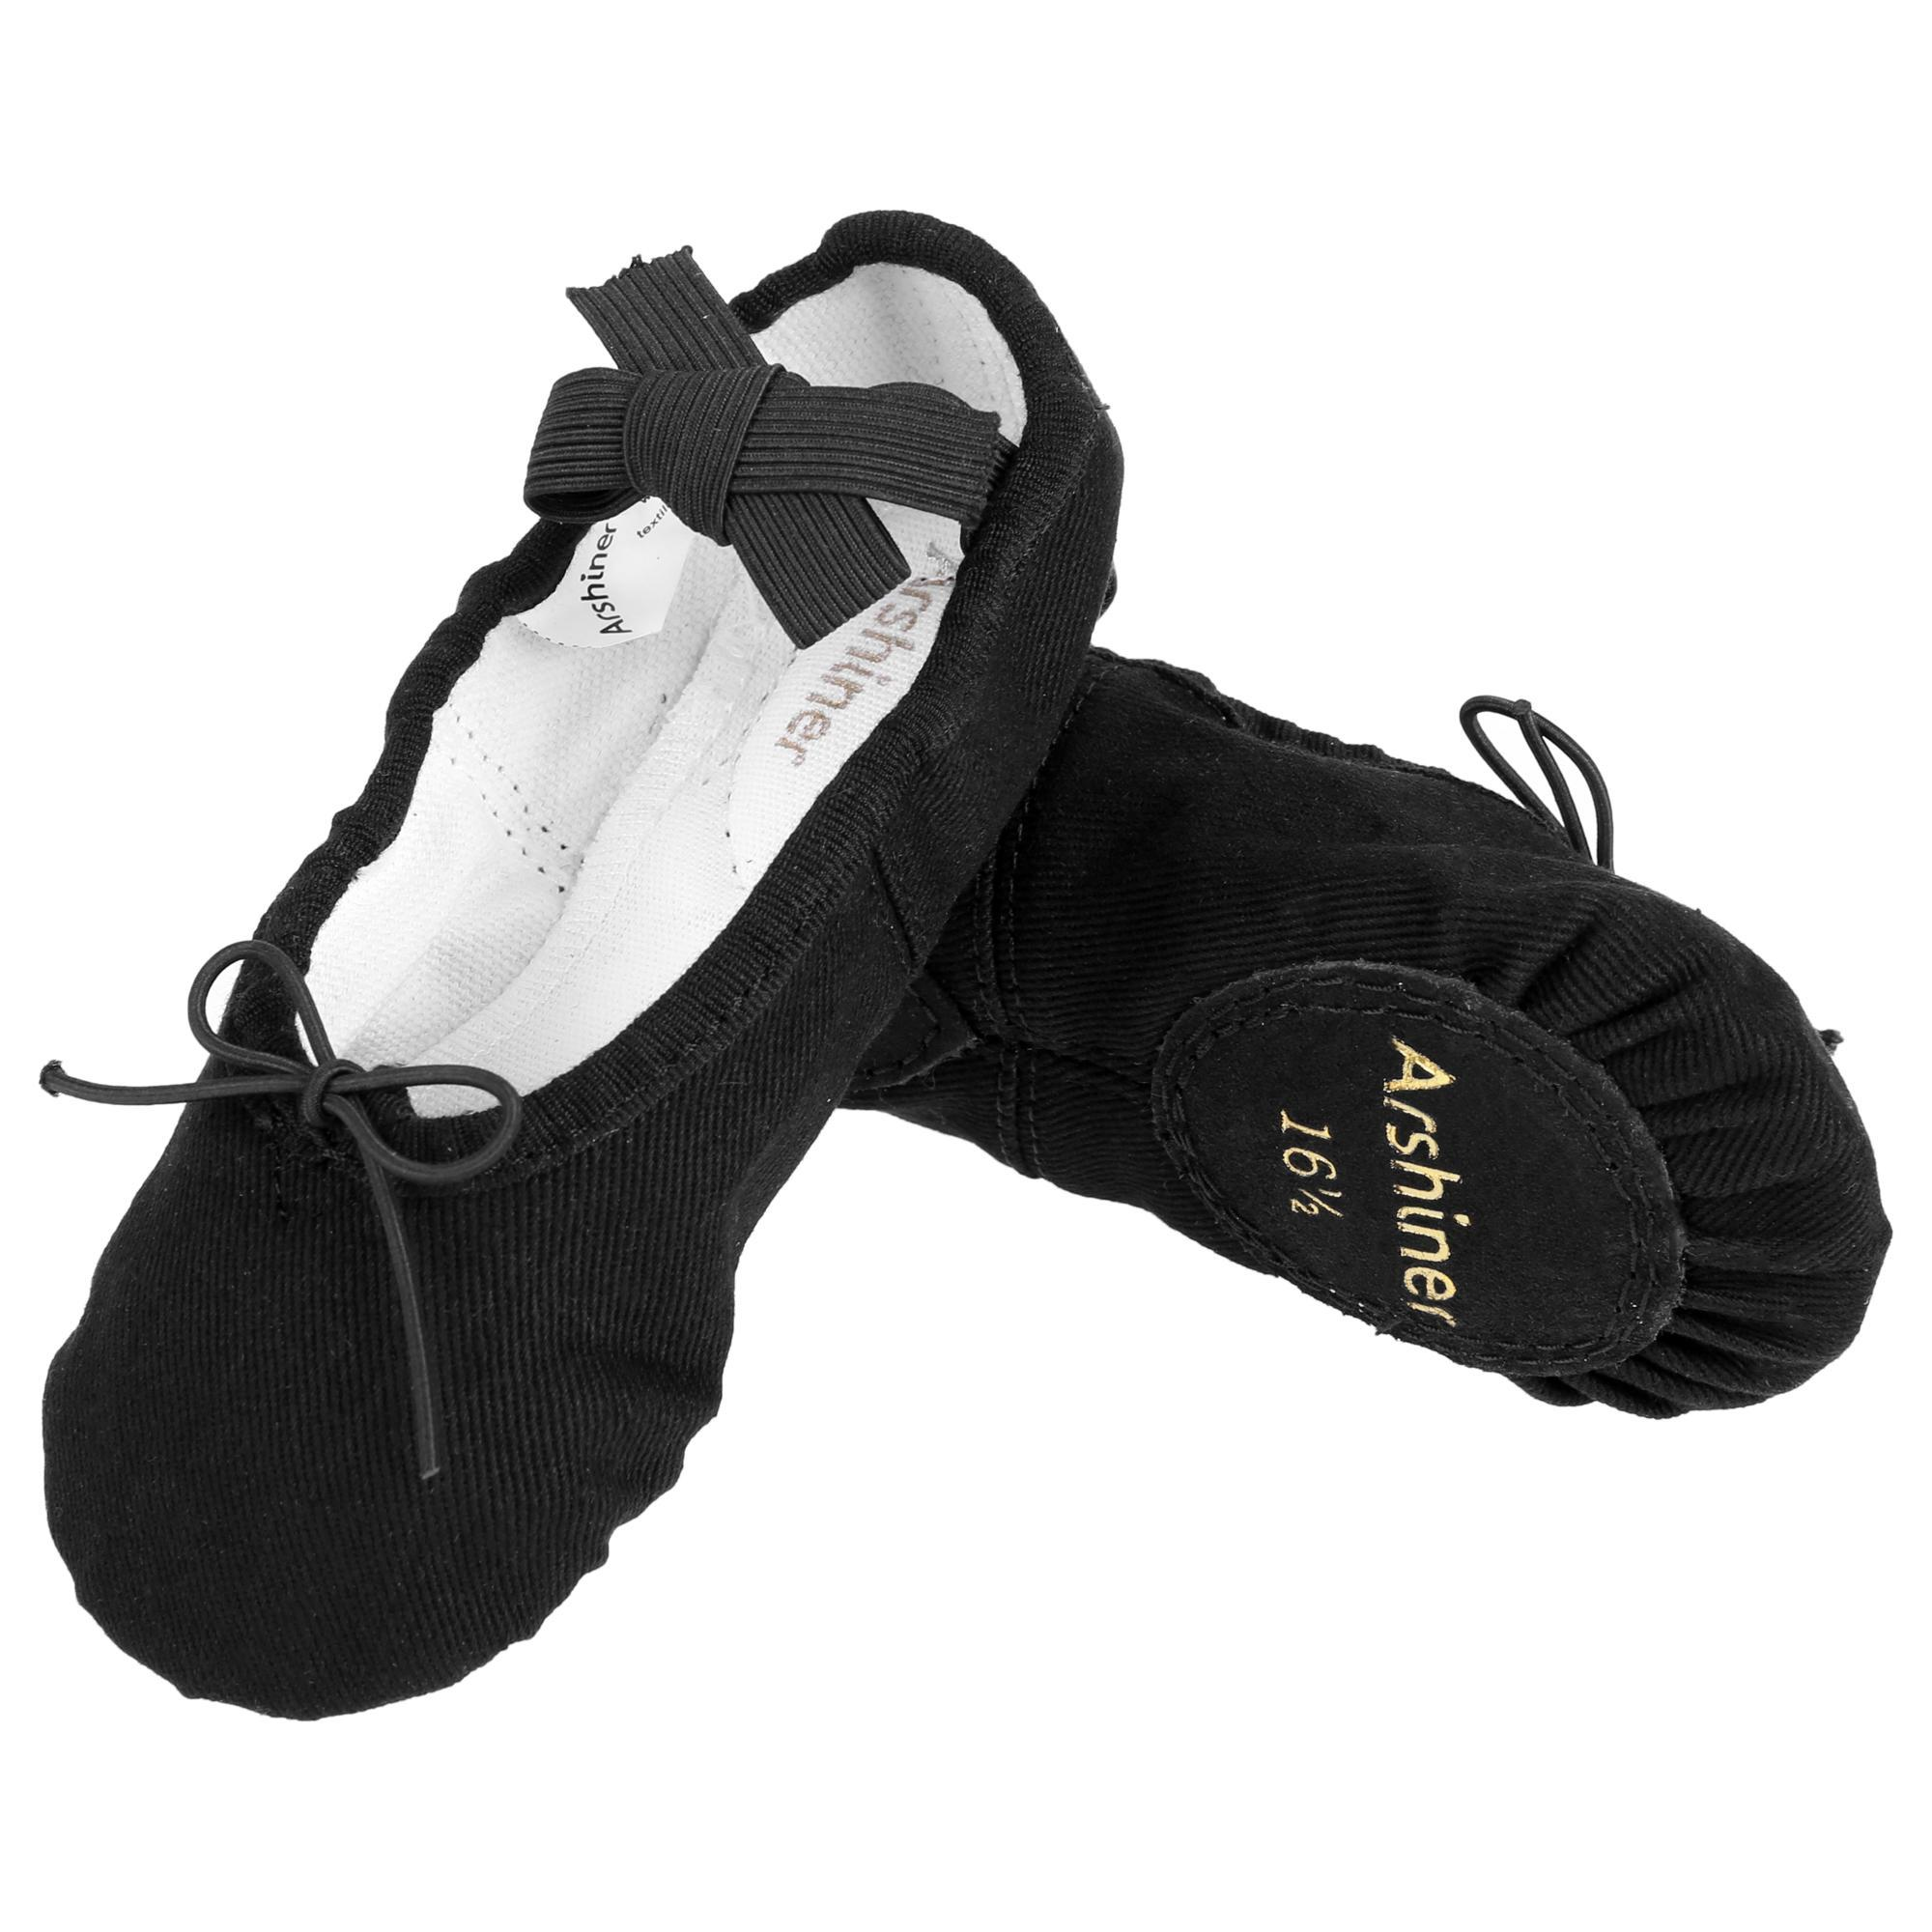 Bestuhot Girls Toddler Ballet Shoes Kids Ballet Slippers, Cotton blend by